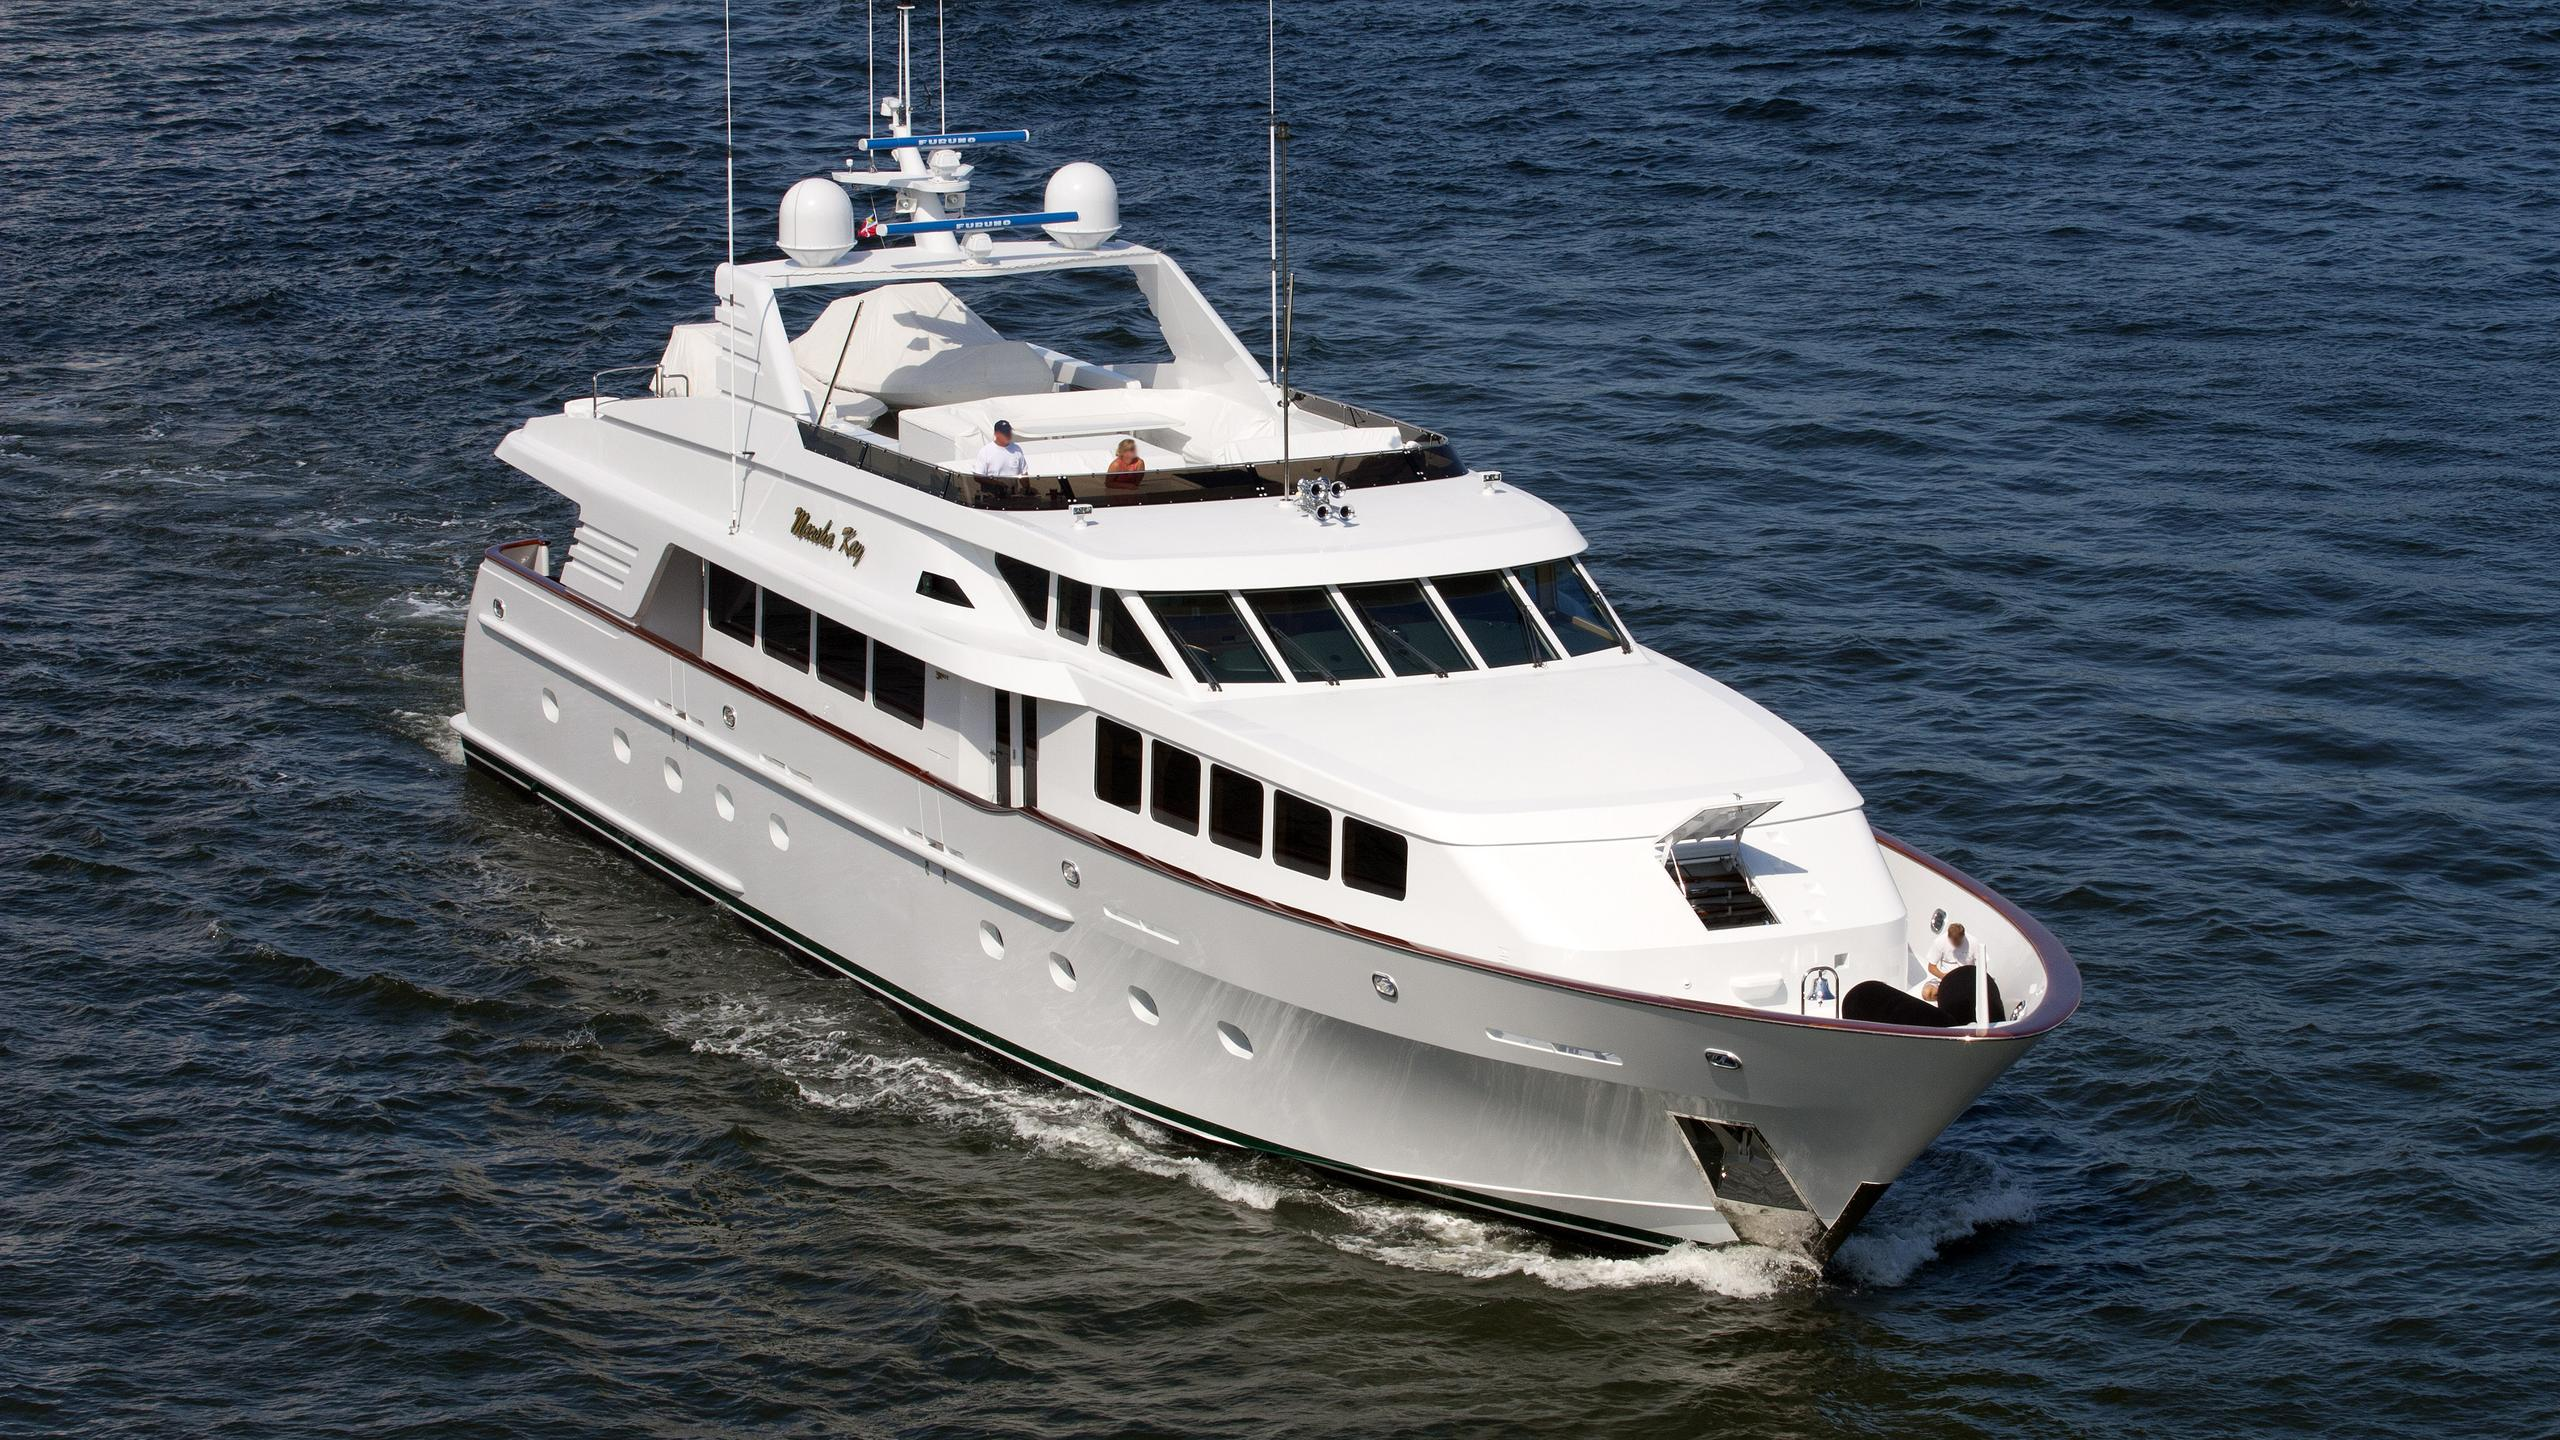 marsha-kay-motor-yacht-trinity-victory-lane-118-1998-36m-front-profile